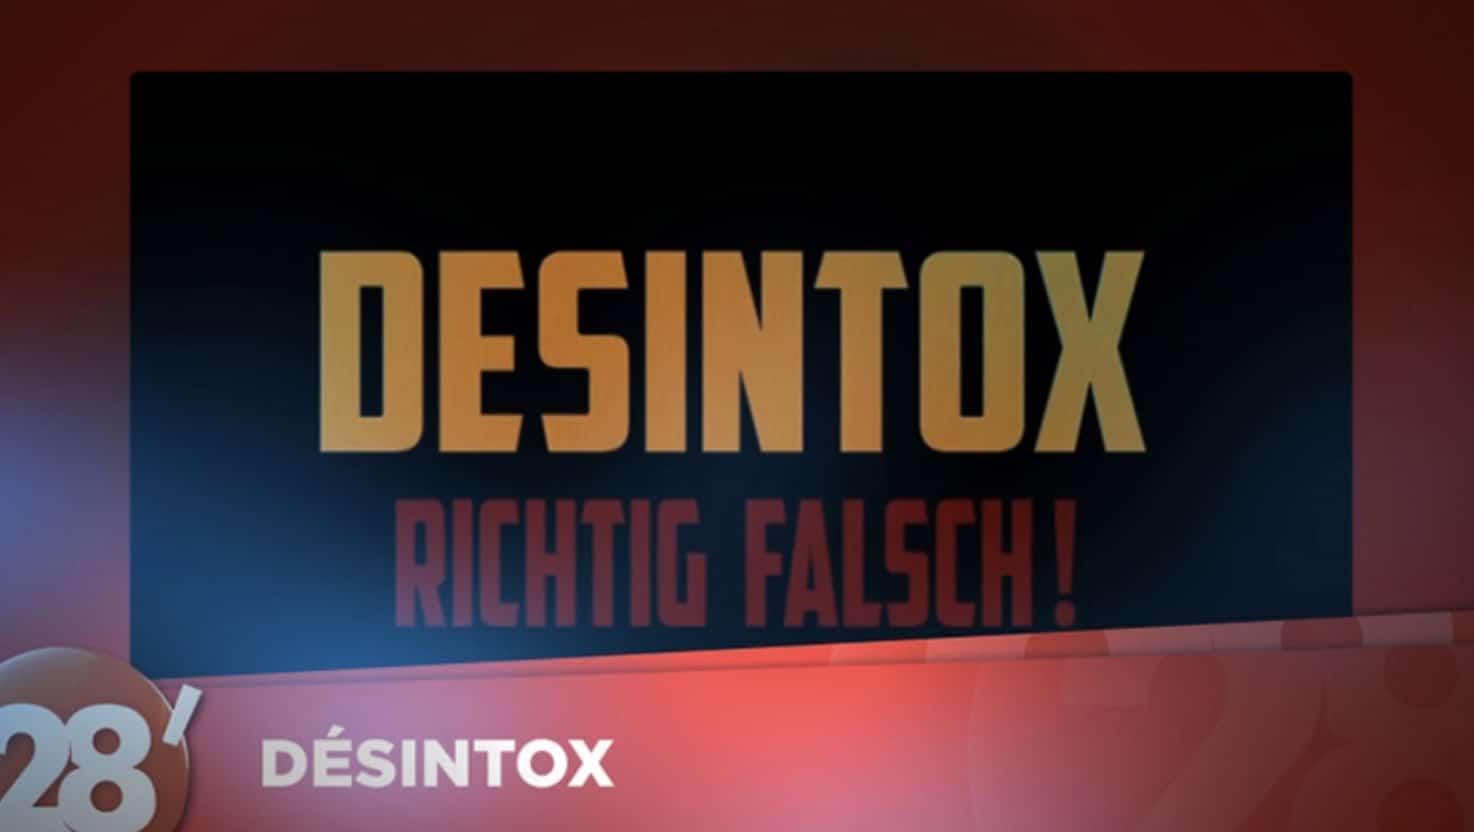 desintox